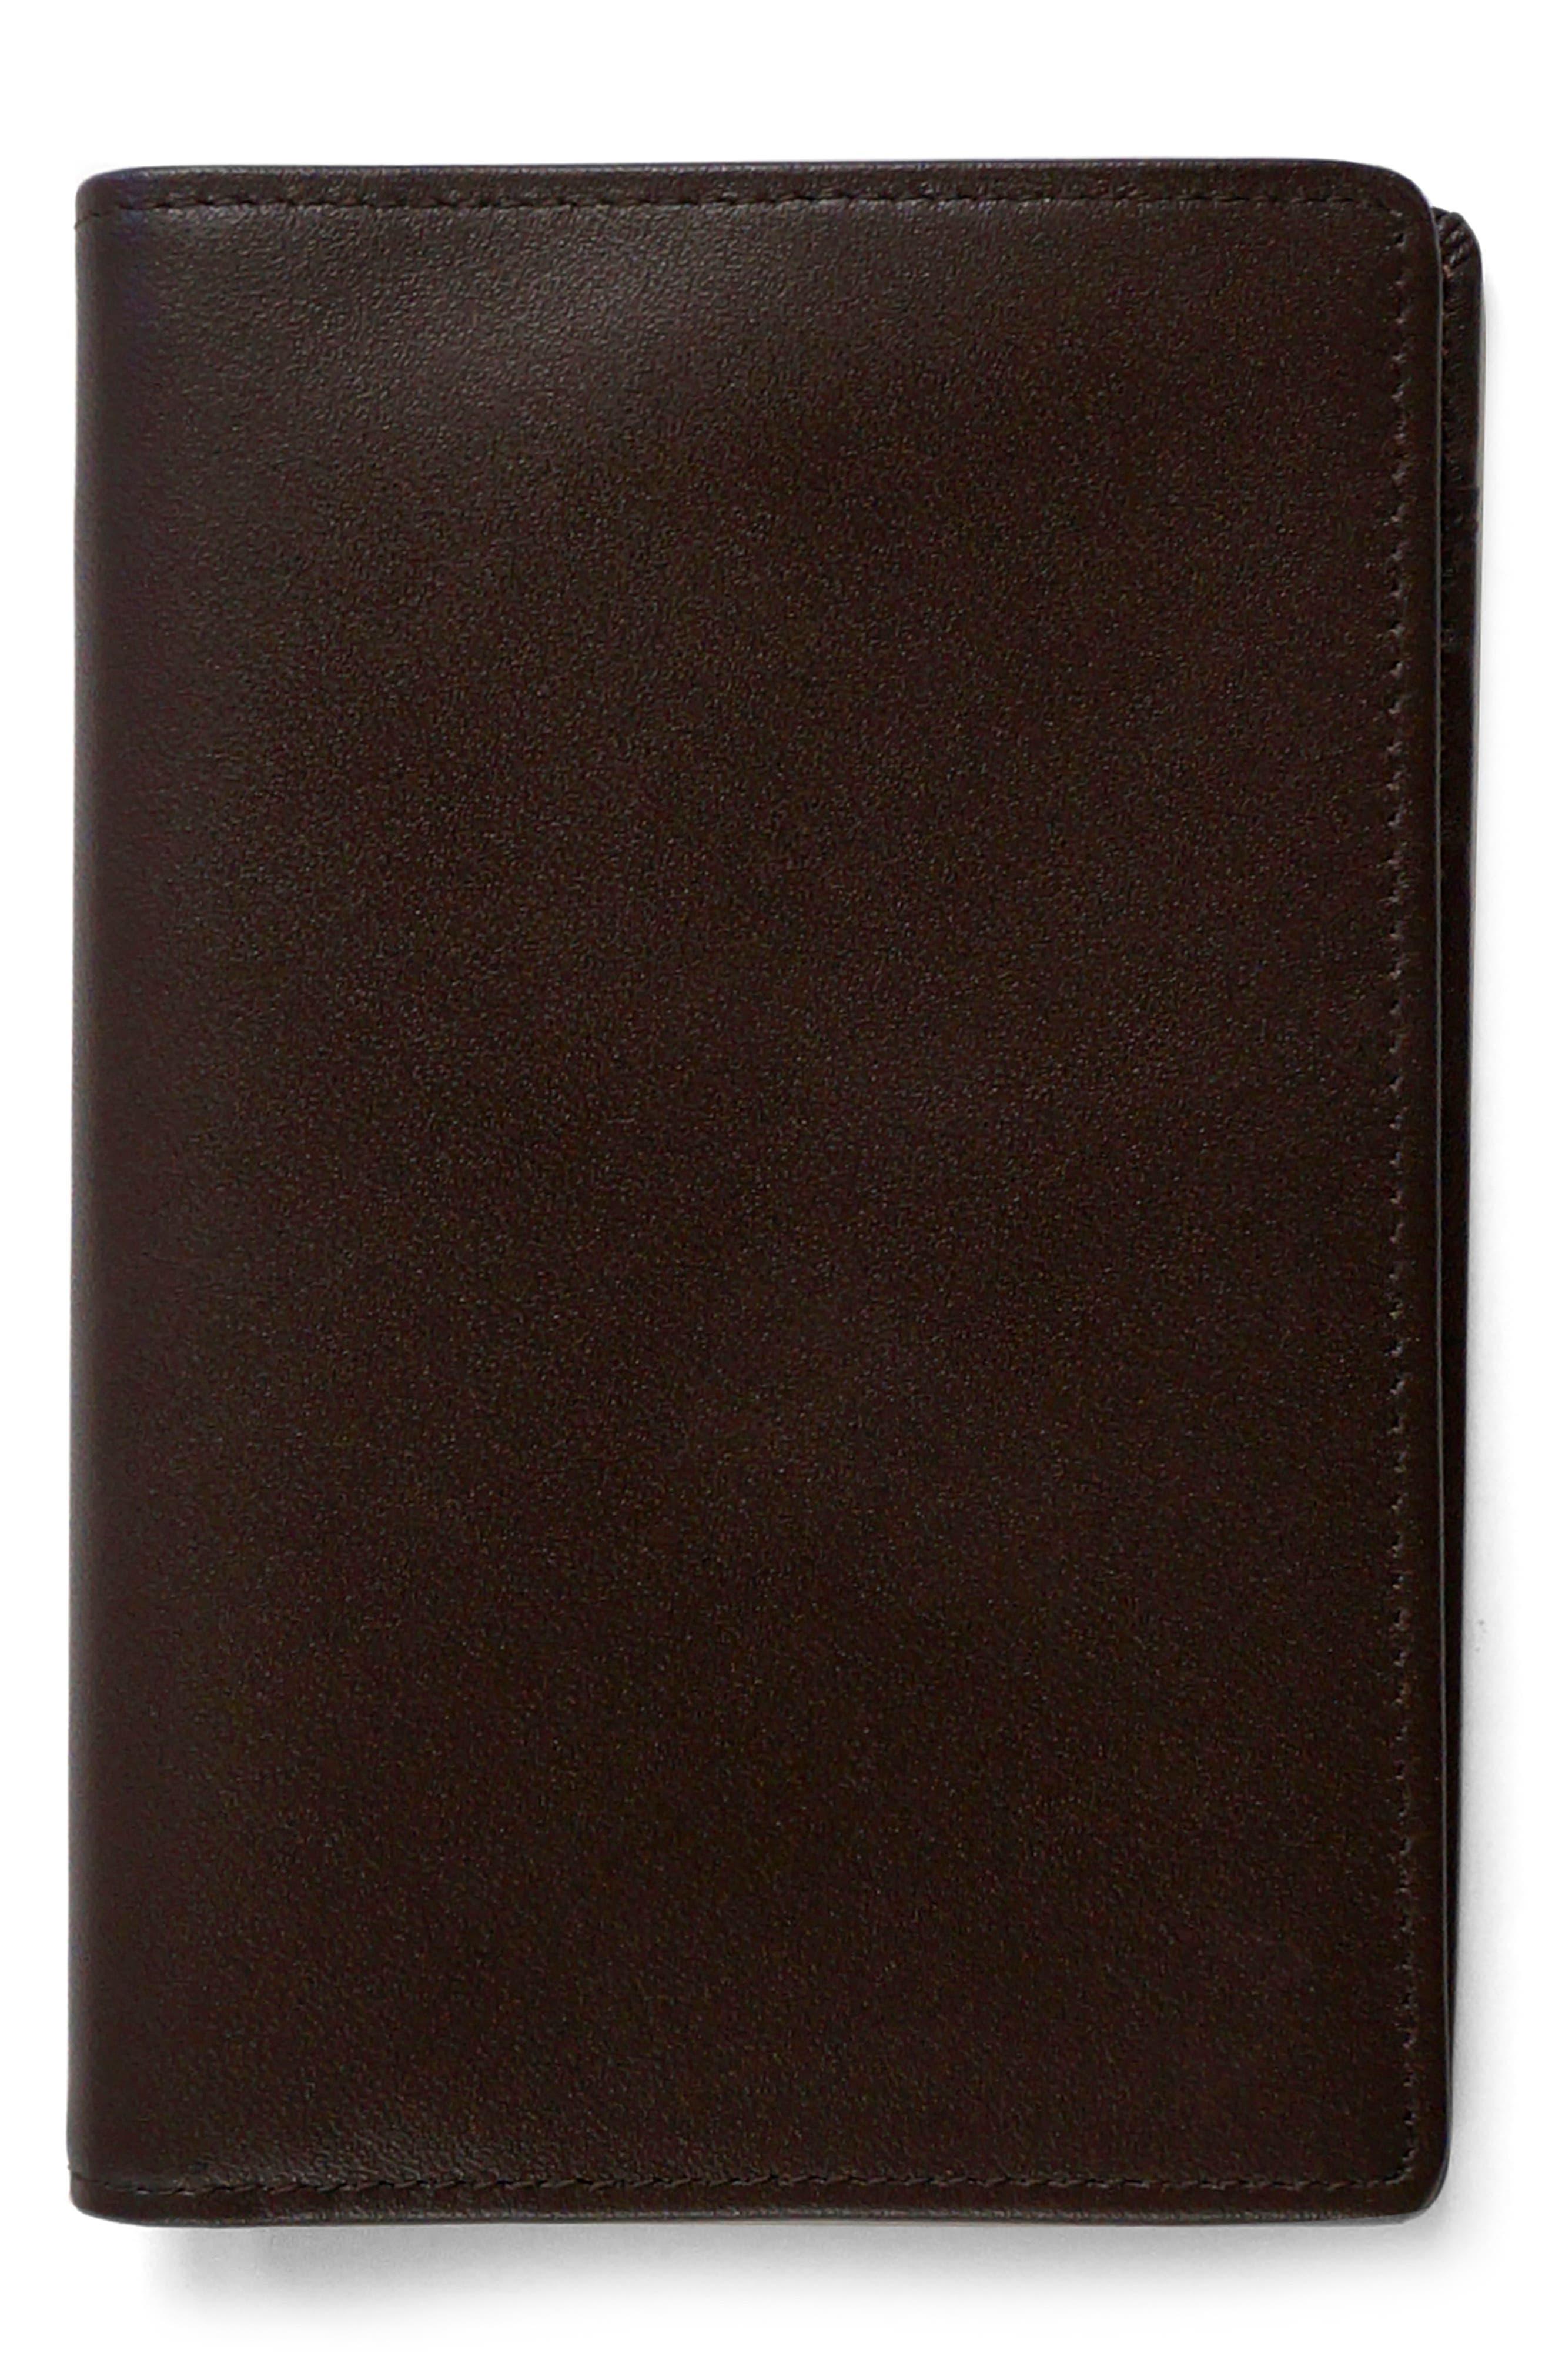 'Grant' Rfid Blocker Leather Passport Case